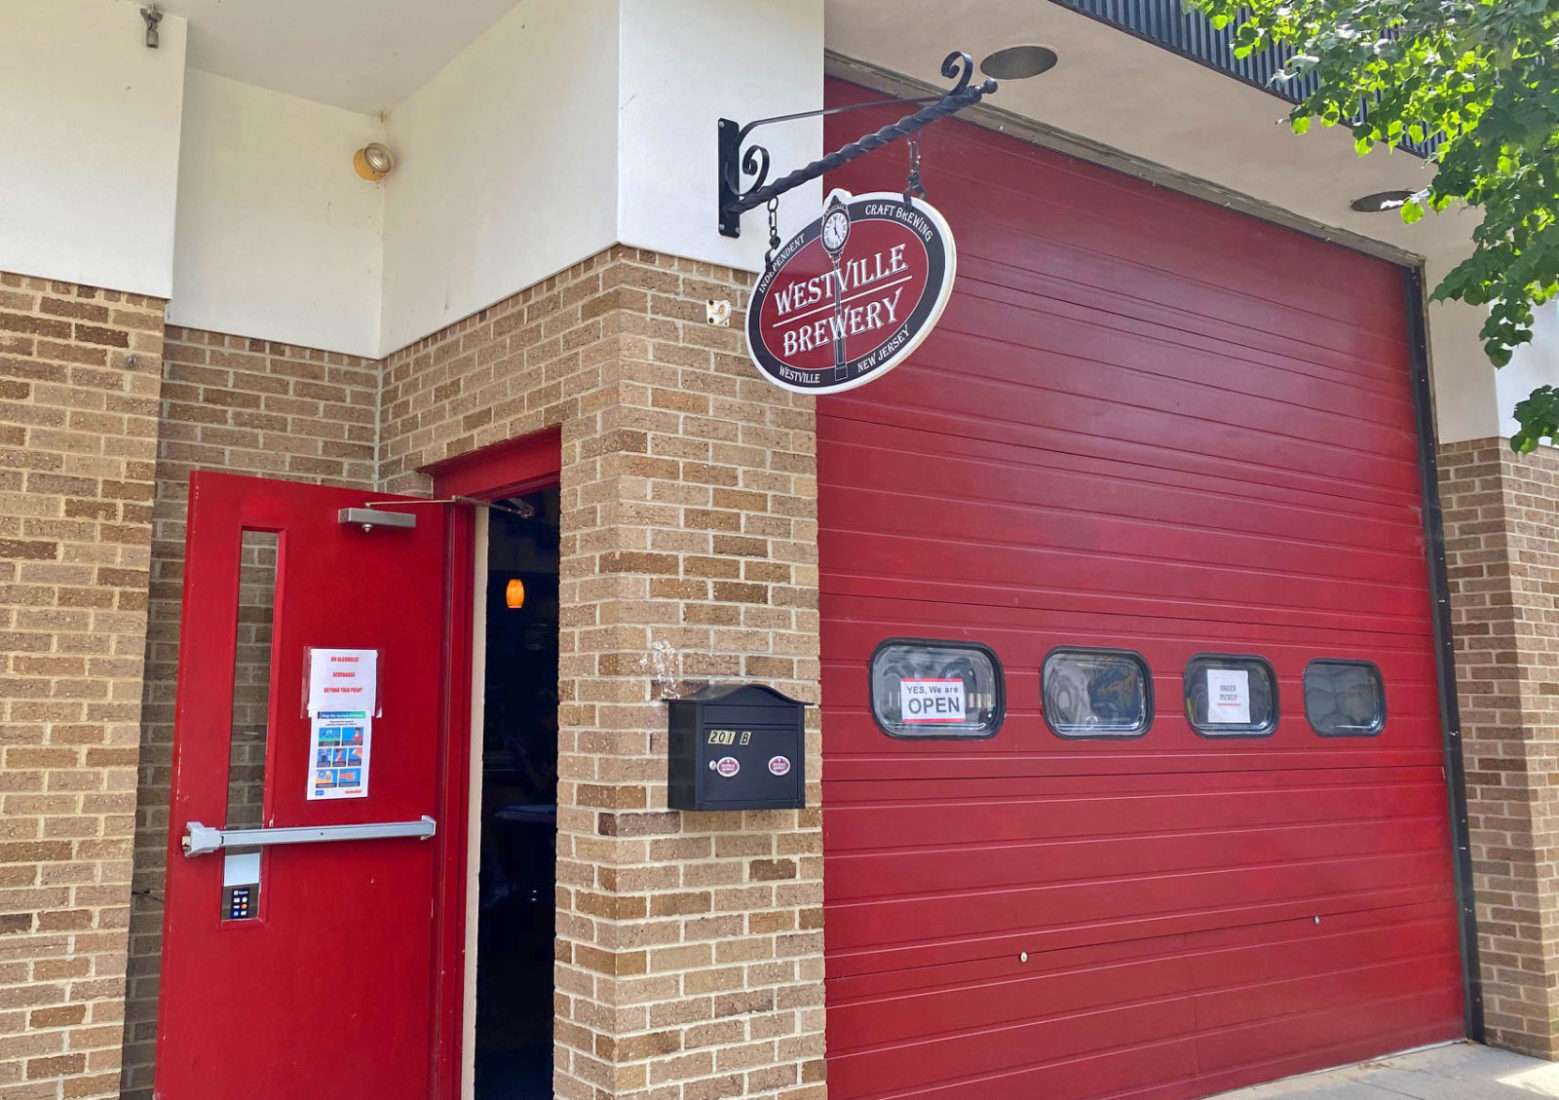 473. Westville Brewing Co., Westville NJ, 2020